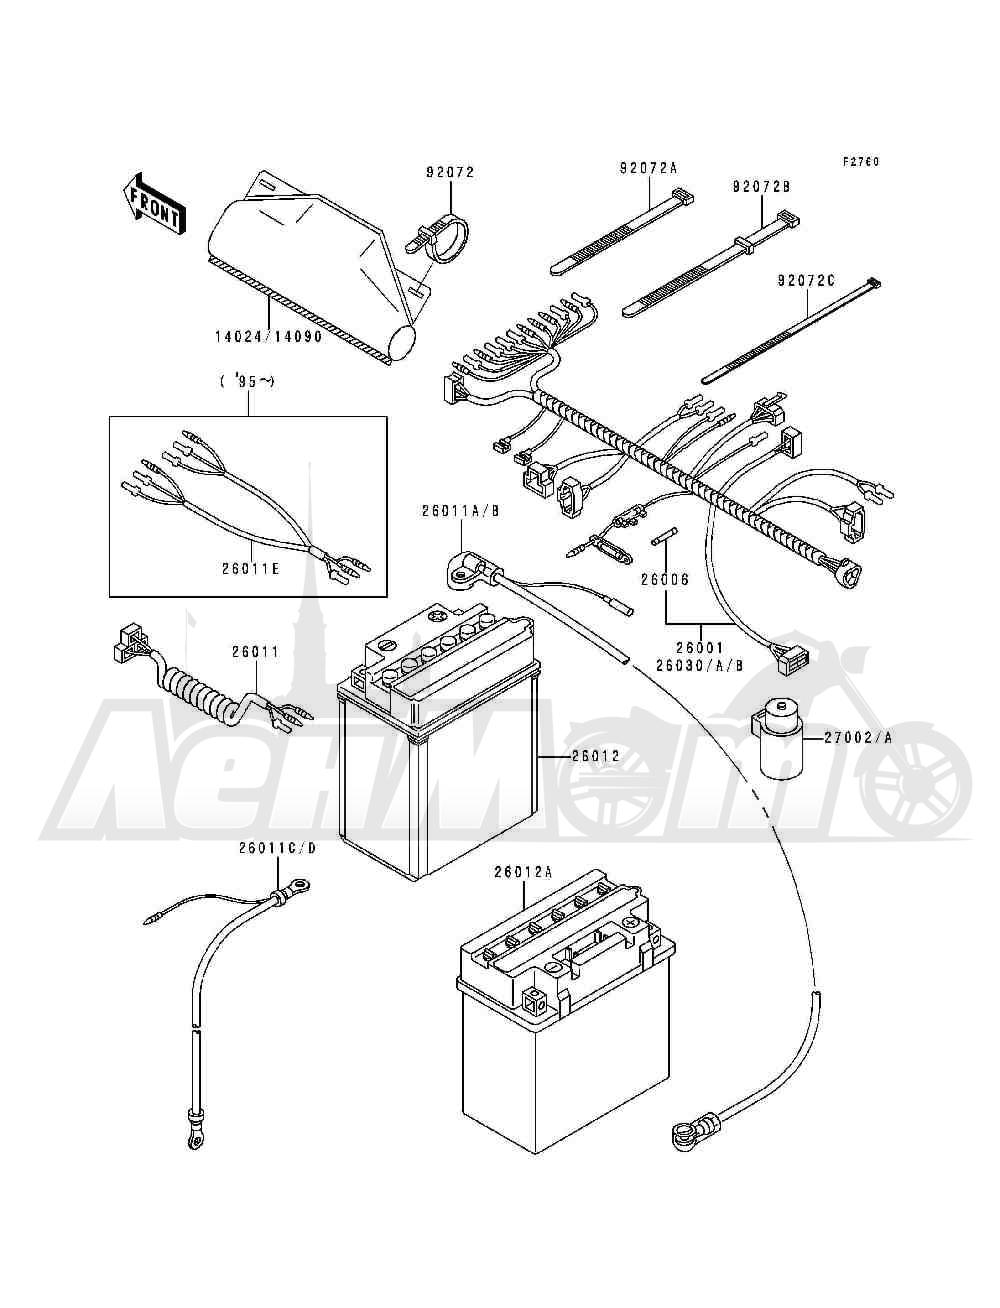 Запчасти для Квадроцикла Kawasaki 1993 BAYOU 300 (KLF300-B6) Раздел: CHASSIS ELECTRICAL EQUIPMENT | шасси электрическое оборудование